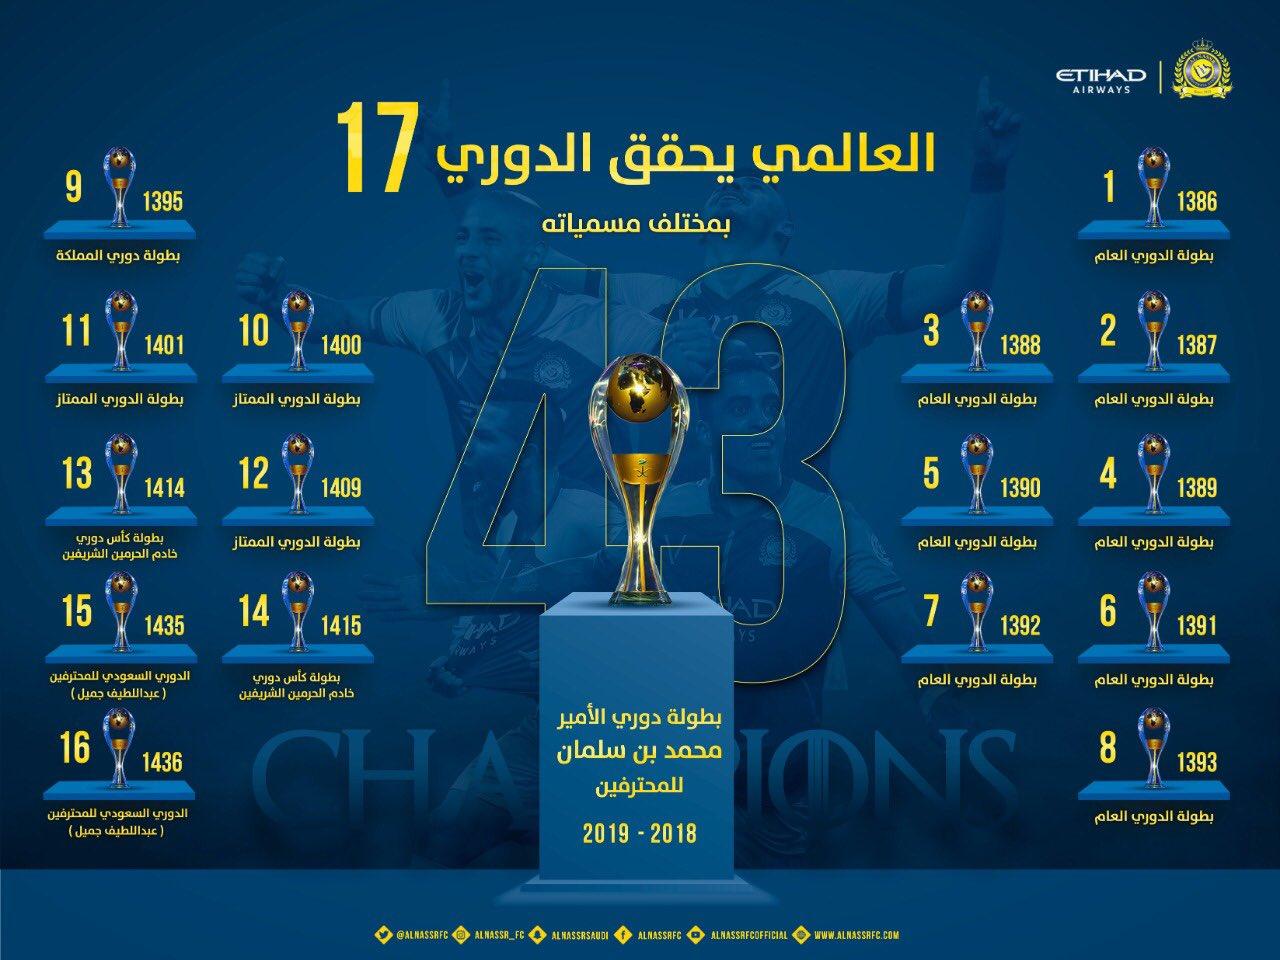 Twitter पर نادي النصر السعودي النصر يحقق الدوري السعودي رقم 17 في تاريخه بمختلف مسمياته النصر بطل دوري محمد بن سلمان